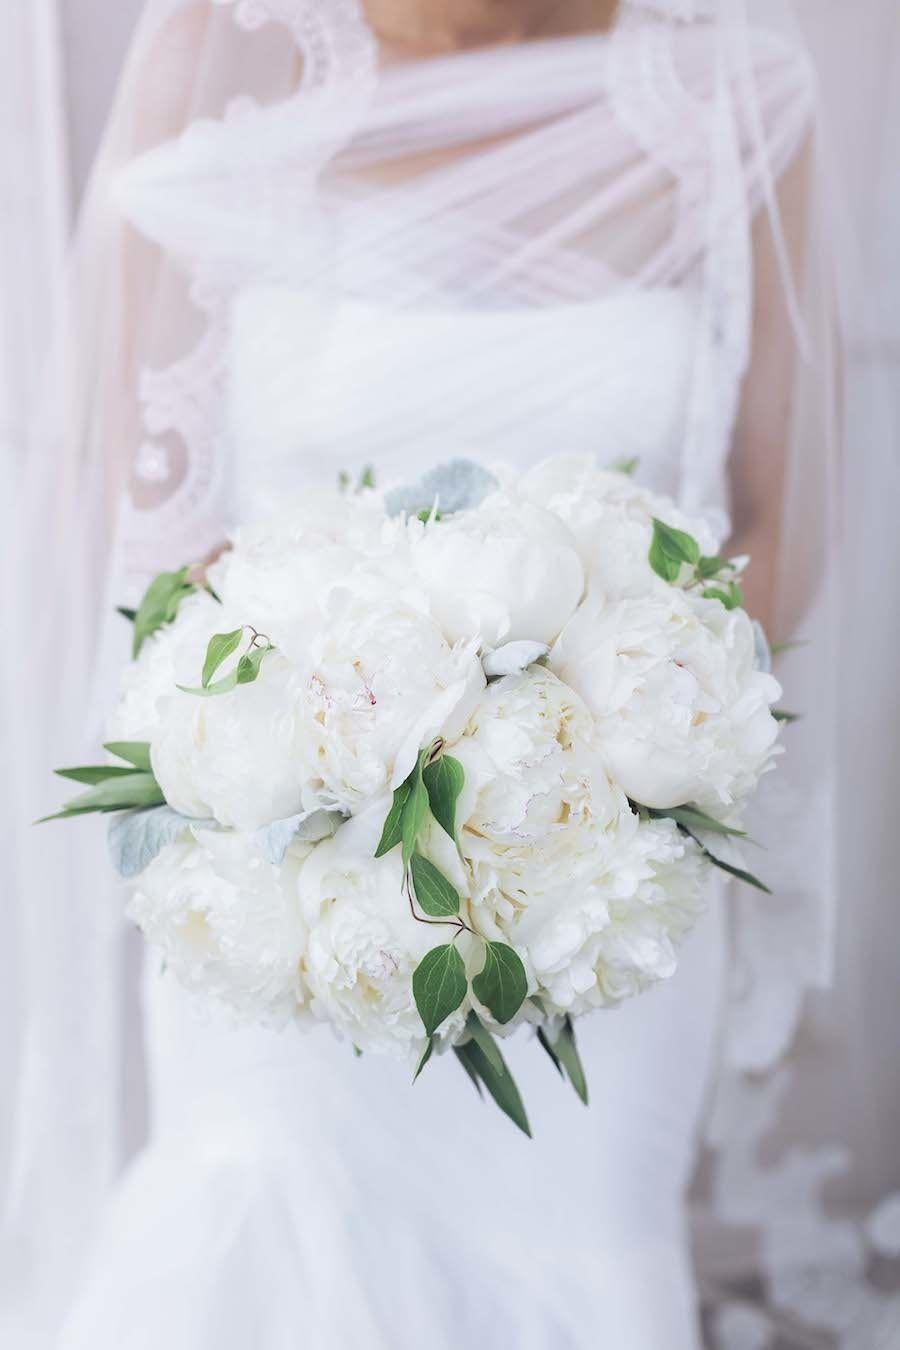 Whimsical white bouquet: http://www.stylemepretty.com/2015/04/08/classic-ballroom-wedding/ | Photography: Sarah Kate - sarahkatephoto.com/